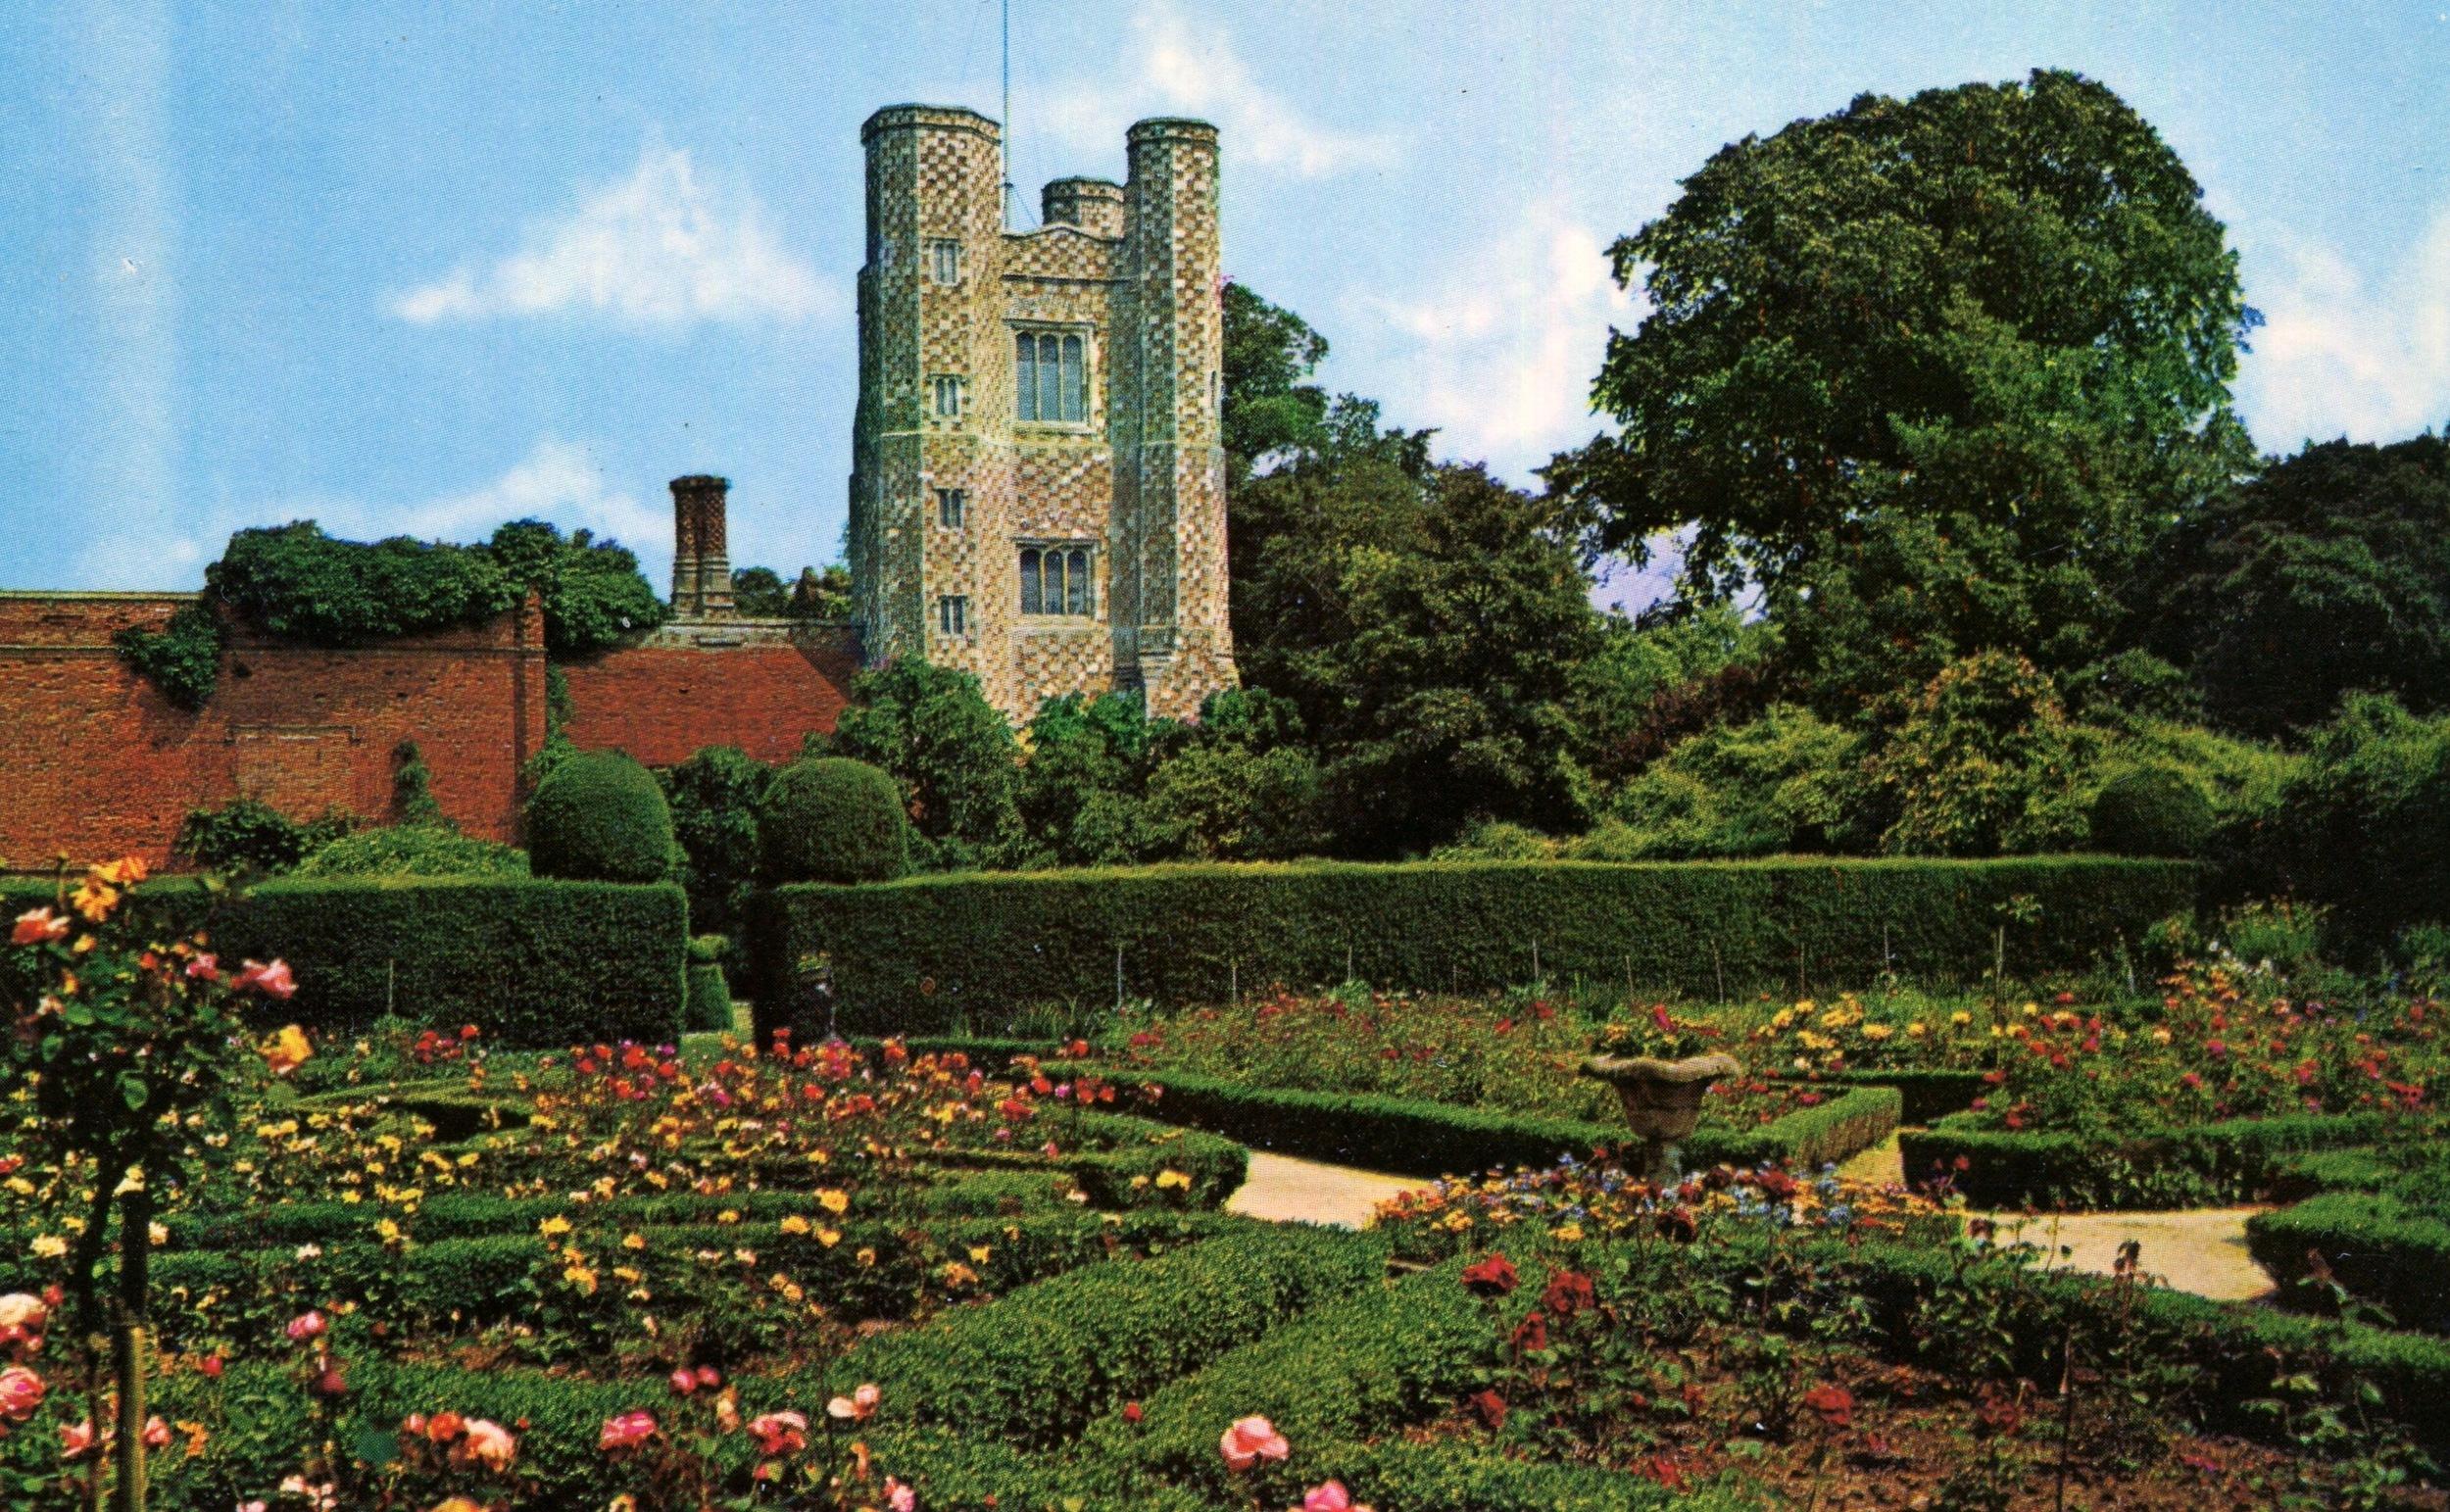 Priory Gardens, St Osyth